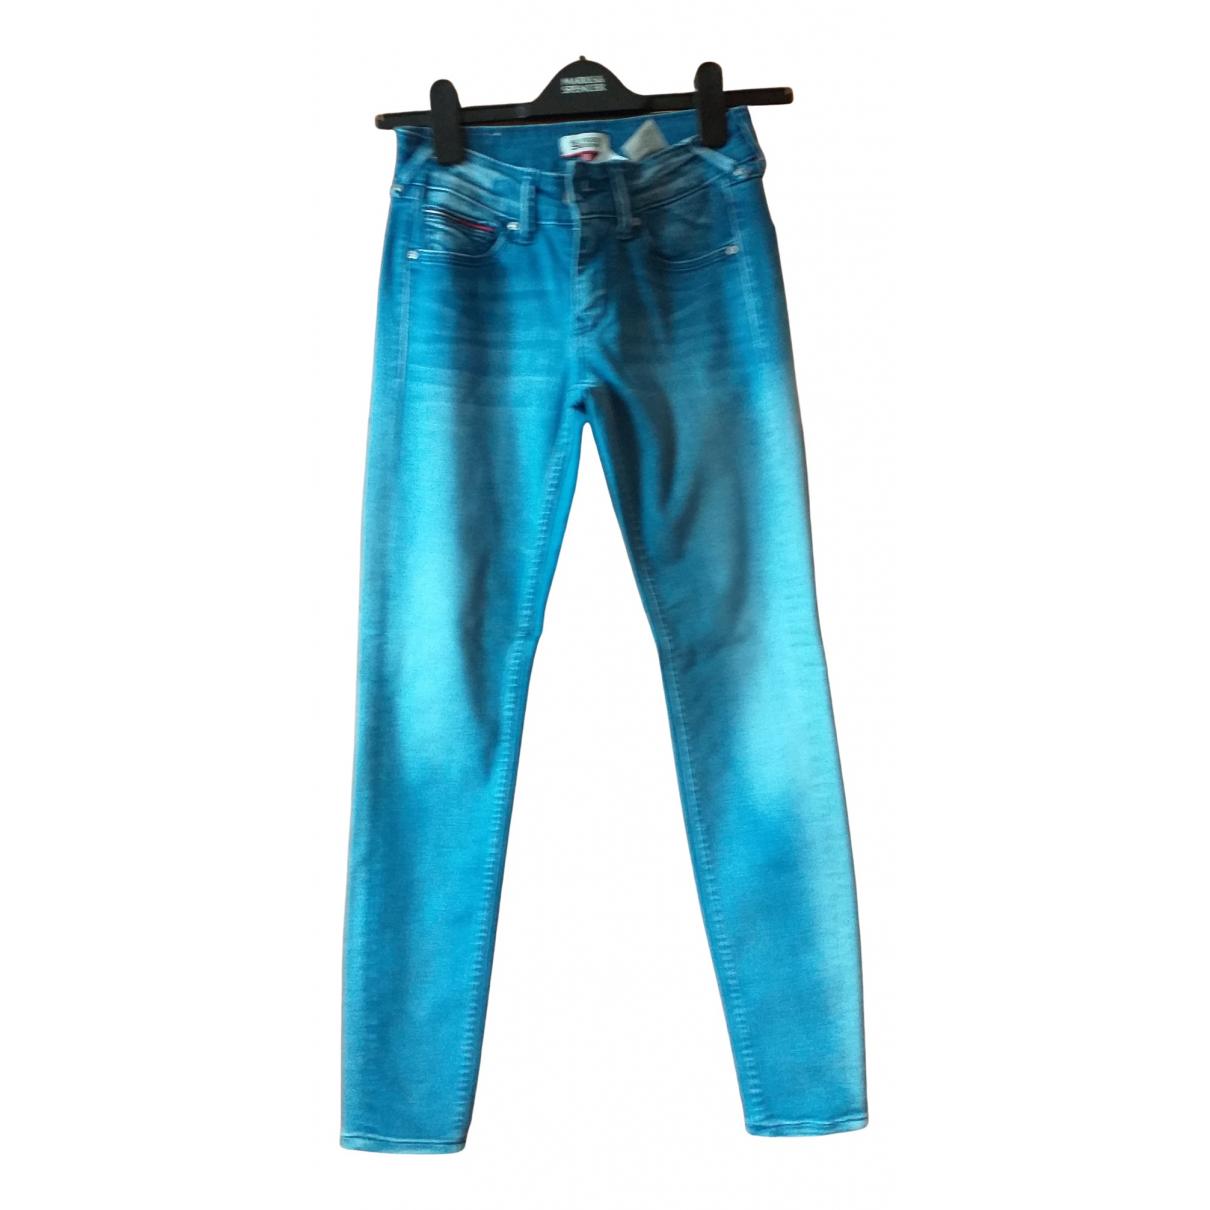 Tommy Hilfiger - Jean   pour femme en denim - bleu